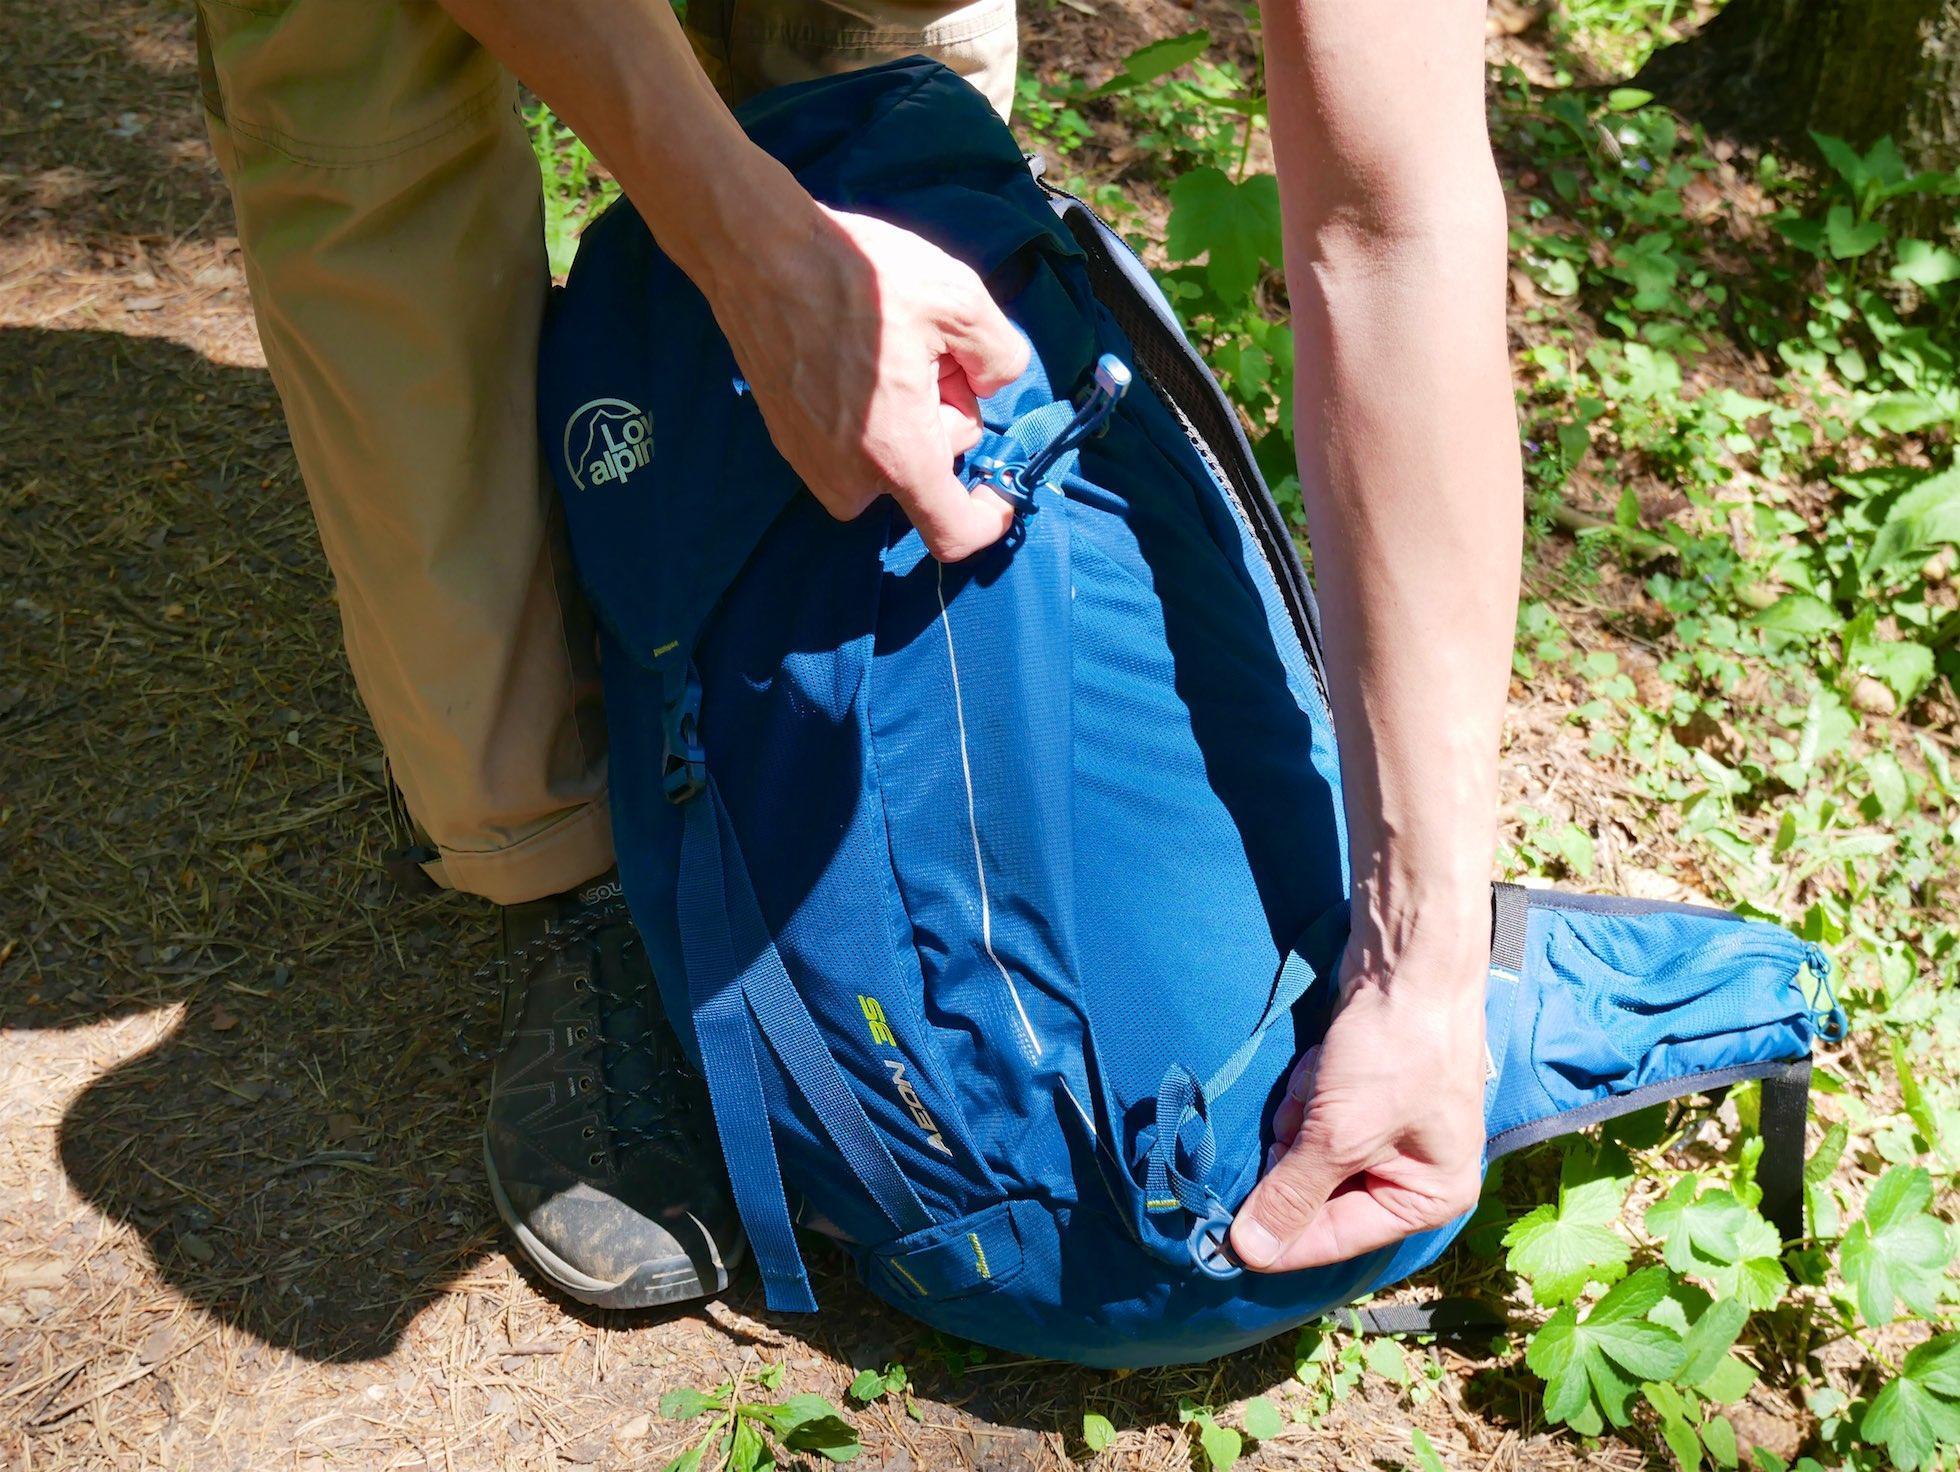 d312bdaff Recenzia: Lowe Alpine Aeon 35 – ľahký turistický batoh | HIKING.SK